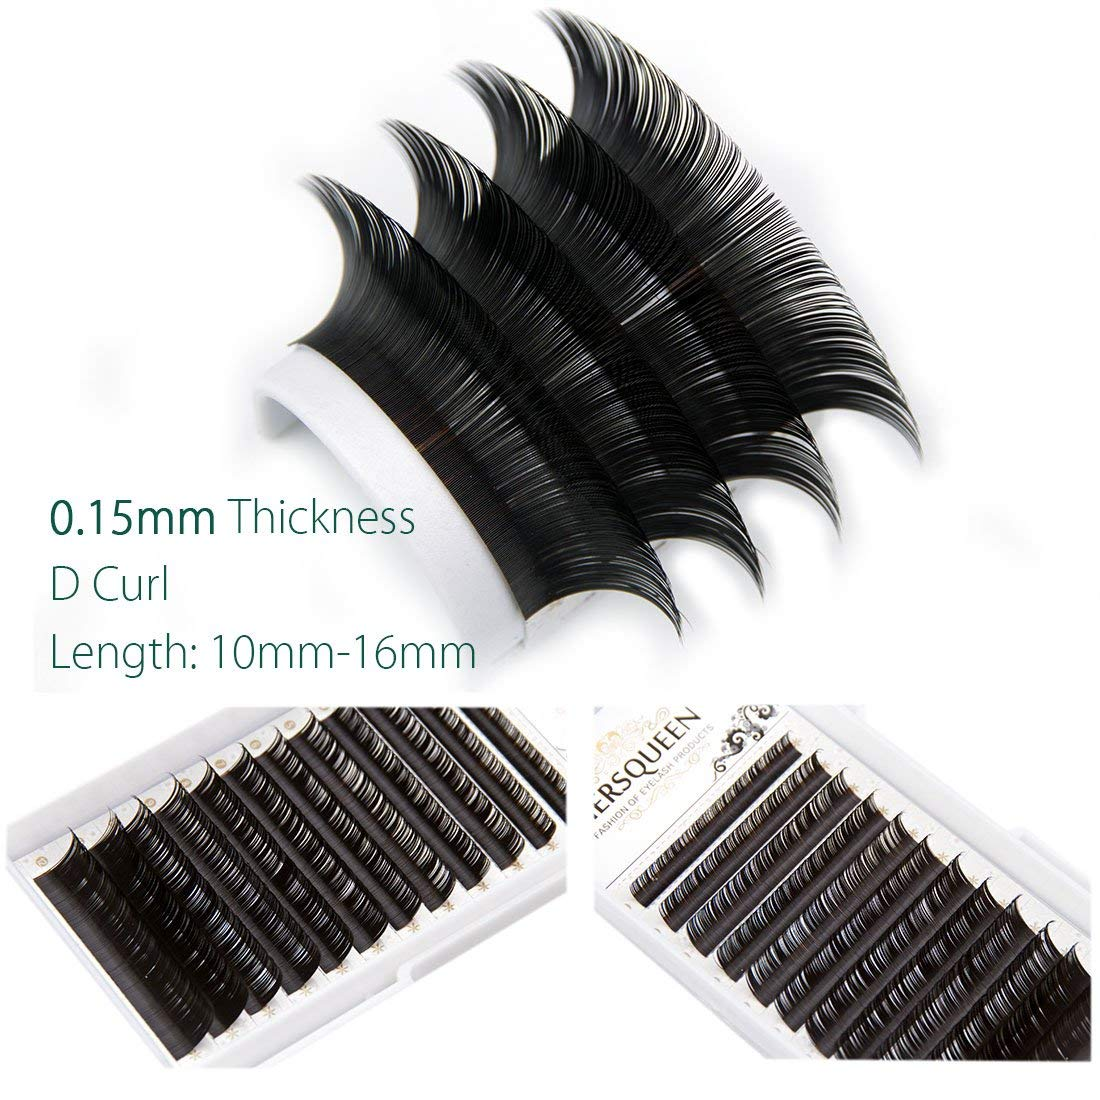 de37c81240a Get Quotations · Individual Eyelash .15 C Curl D Curl Professional Salon  Tray Silk Lash Russian Volume Lash